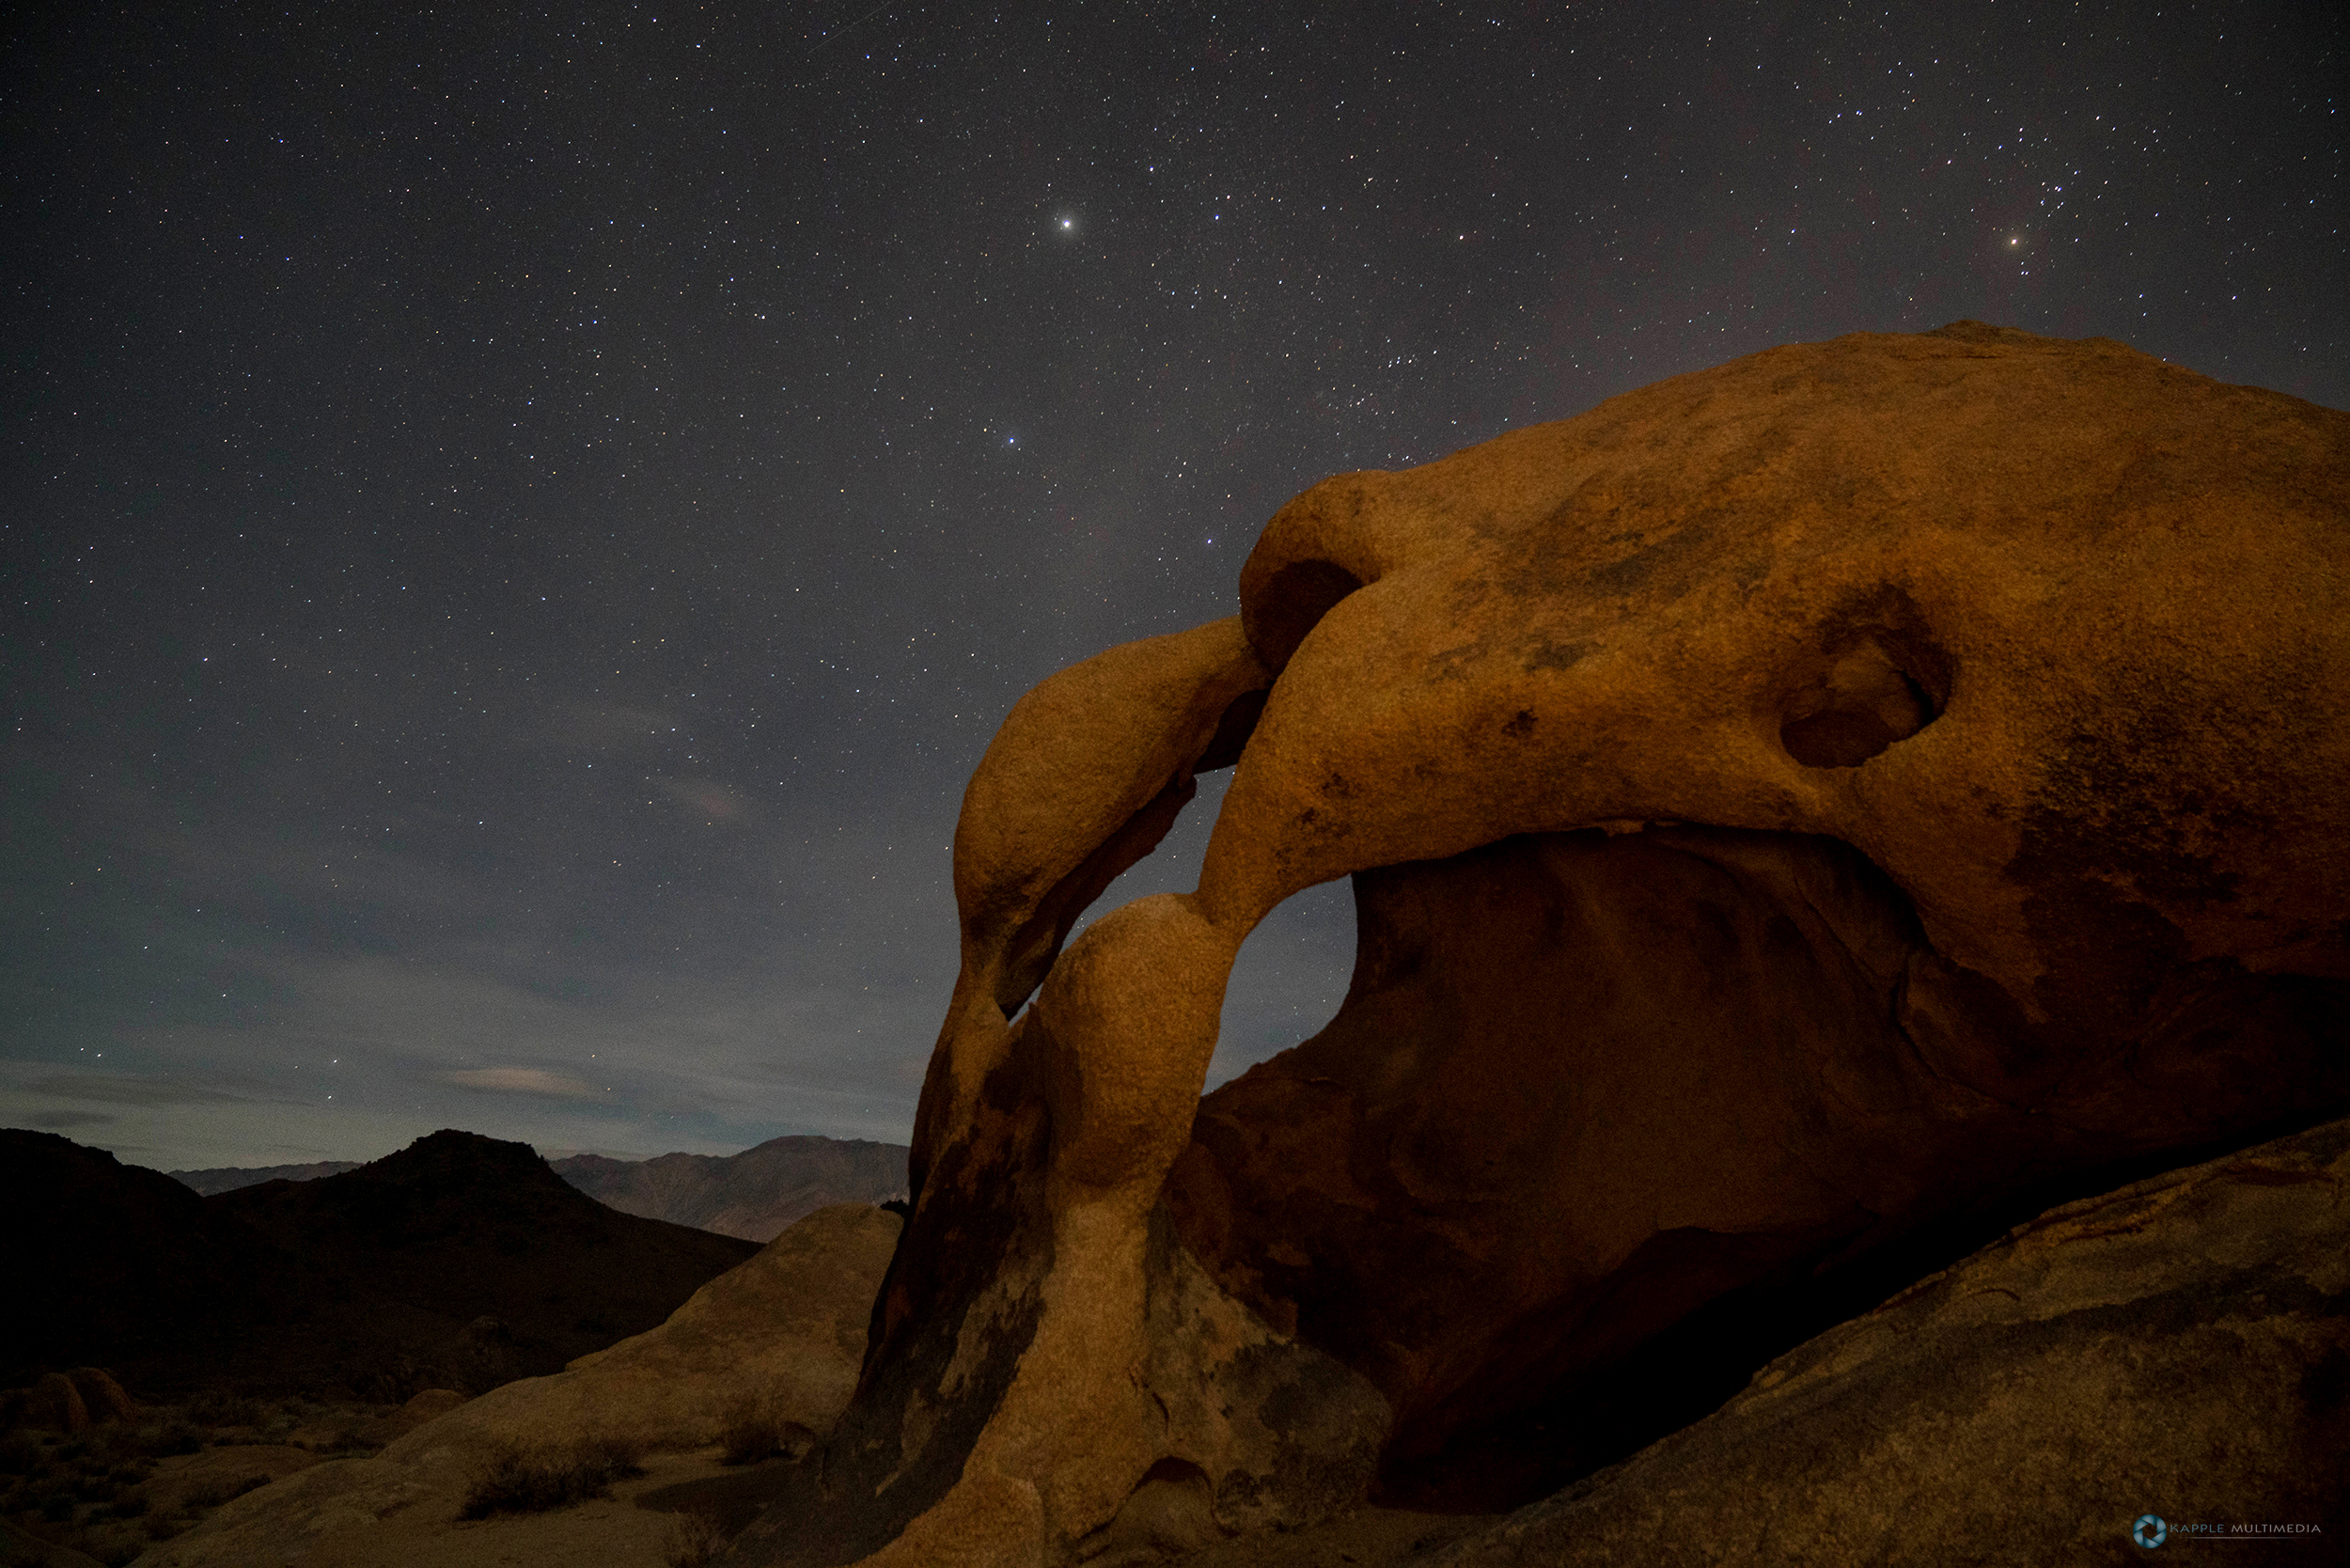 Cyclopse Arch